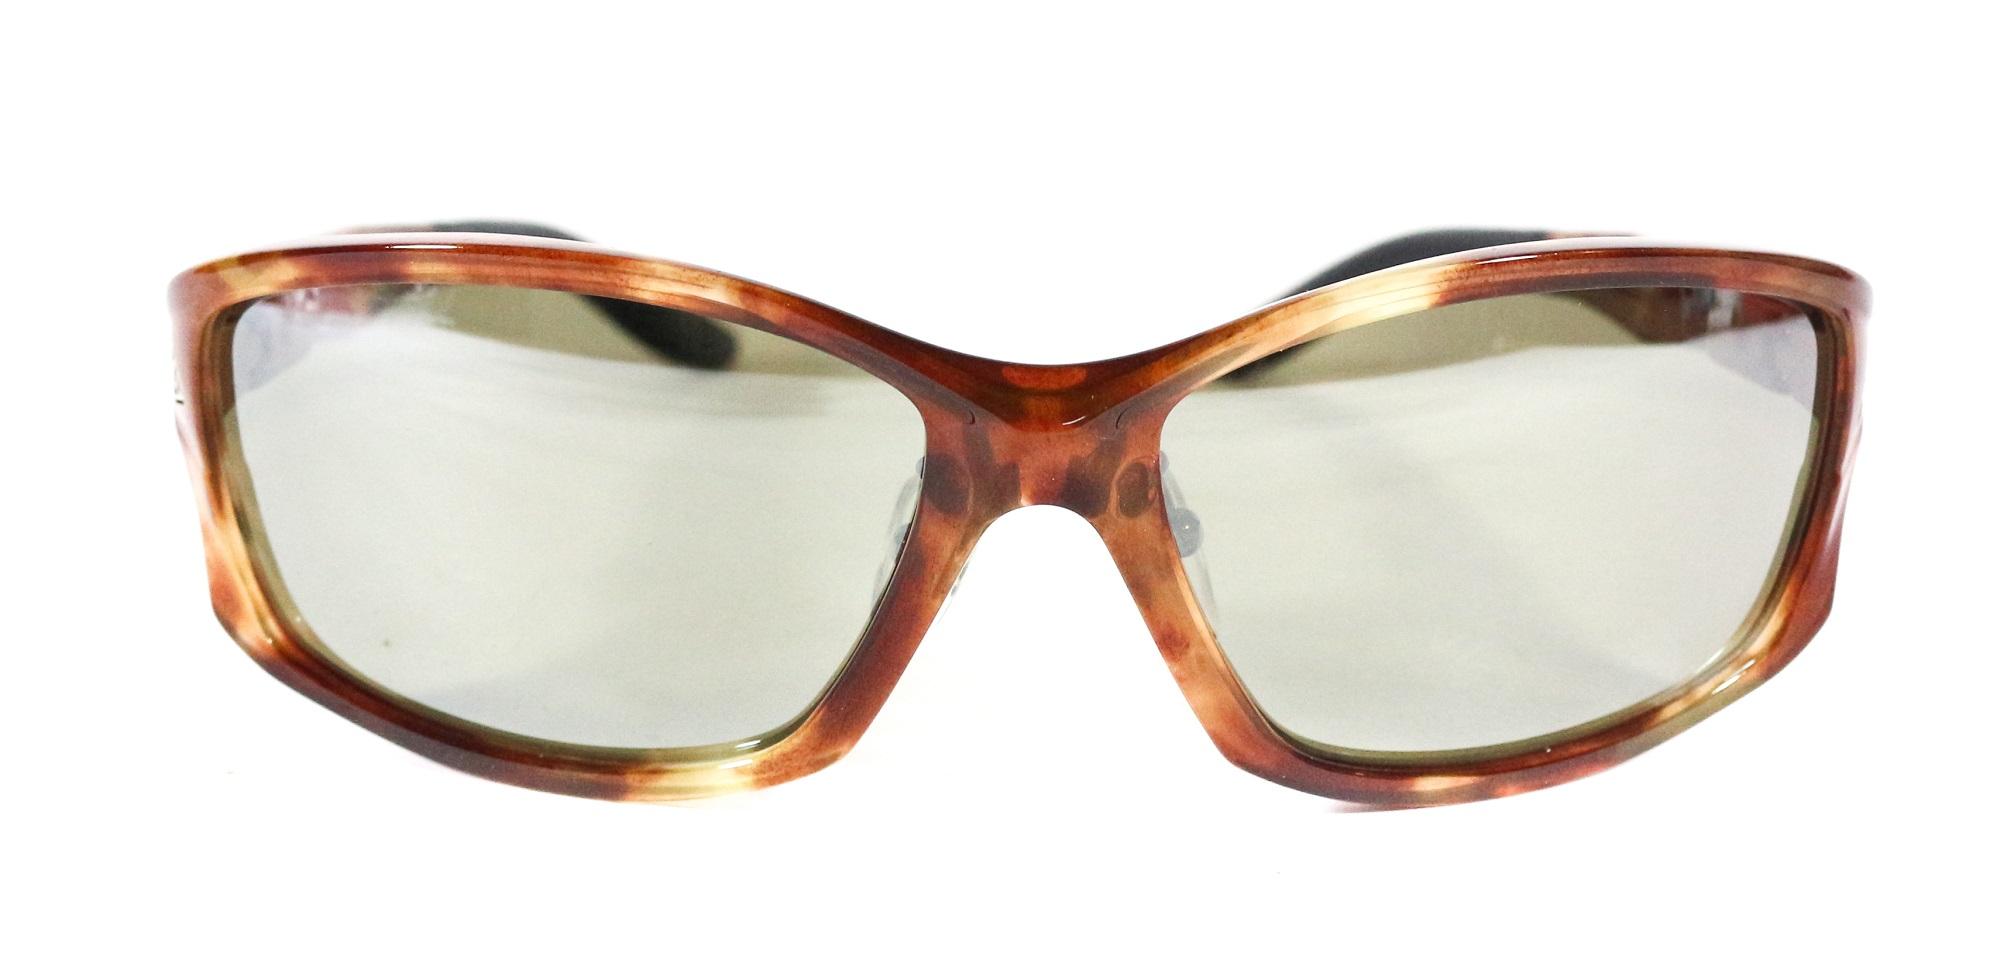 Zeque Polarised Fishing Sunglasses Stealth F-1387 BROWN DEMI TVS (5279)